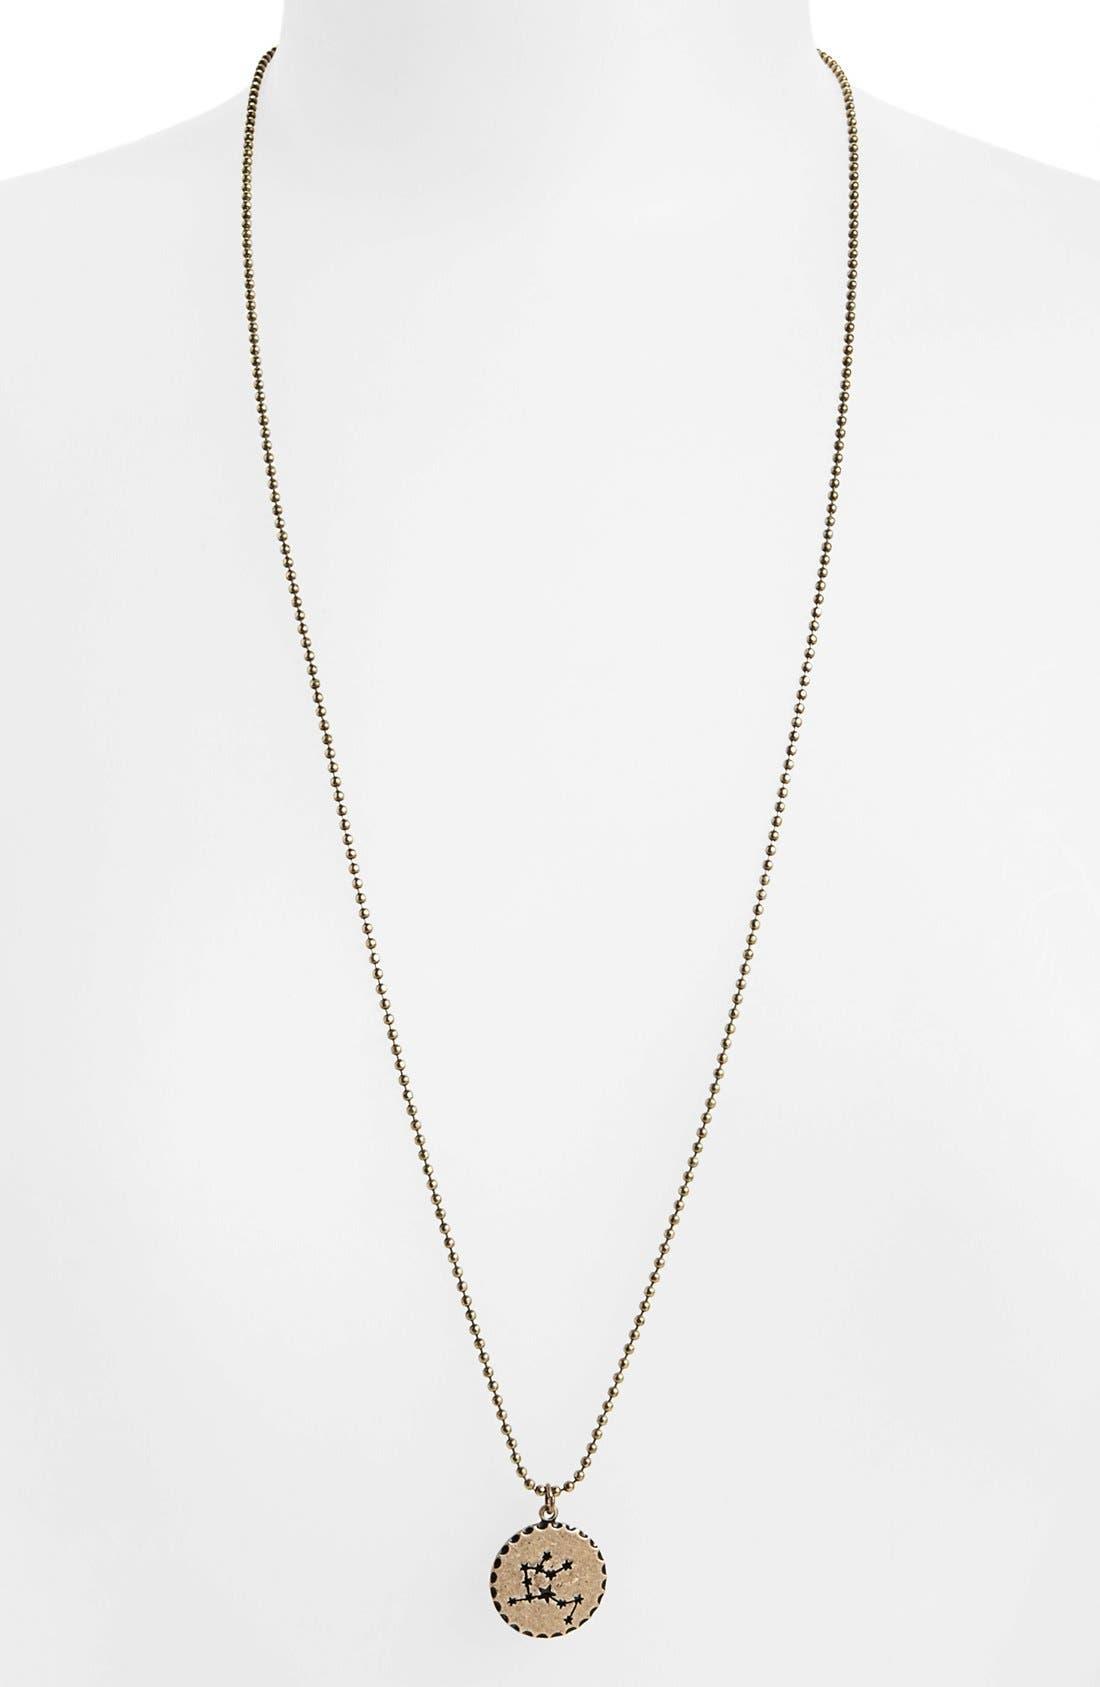 Main Image - Bonnie Jonas 'Zodiac Constellation' Pendant Necklace